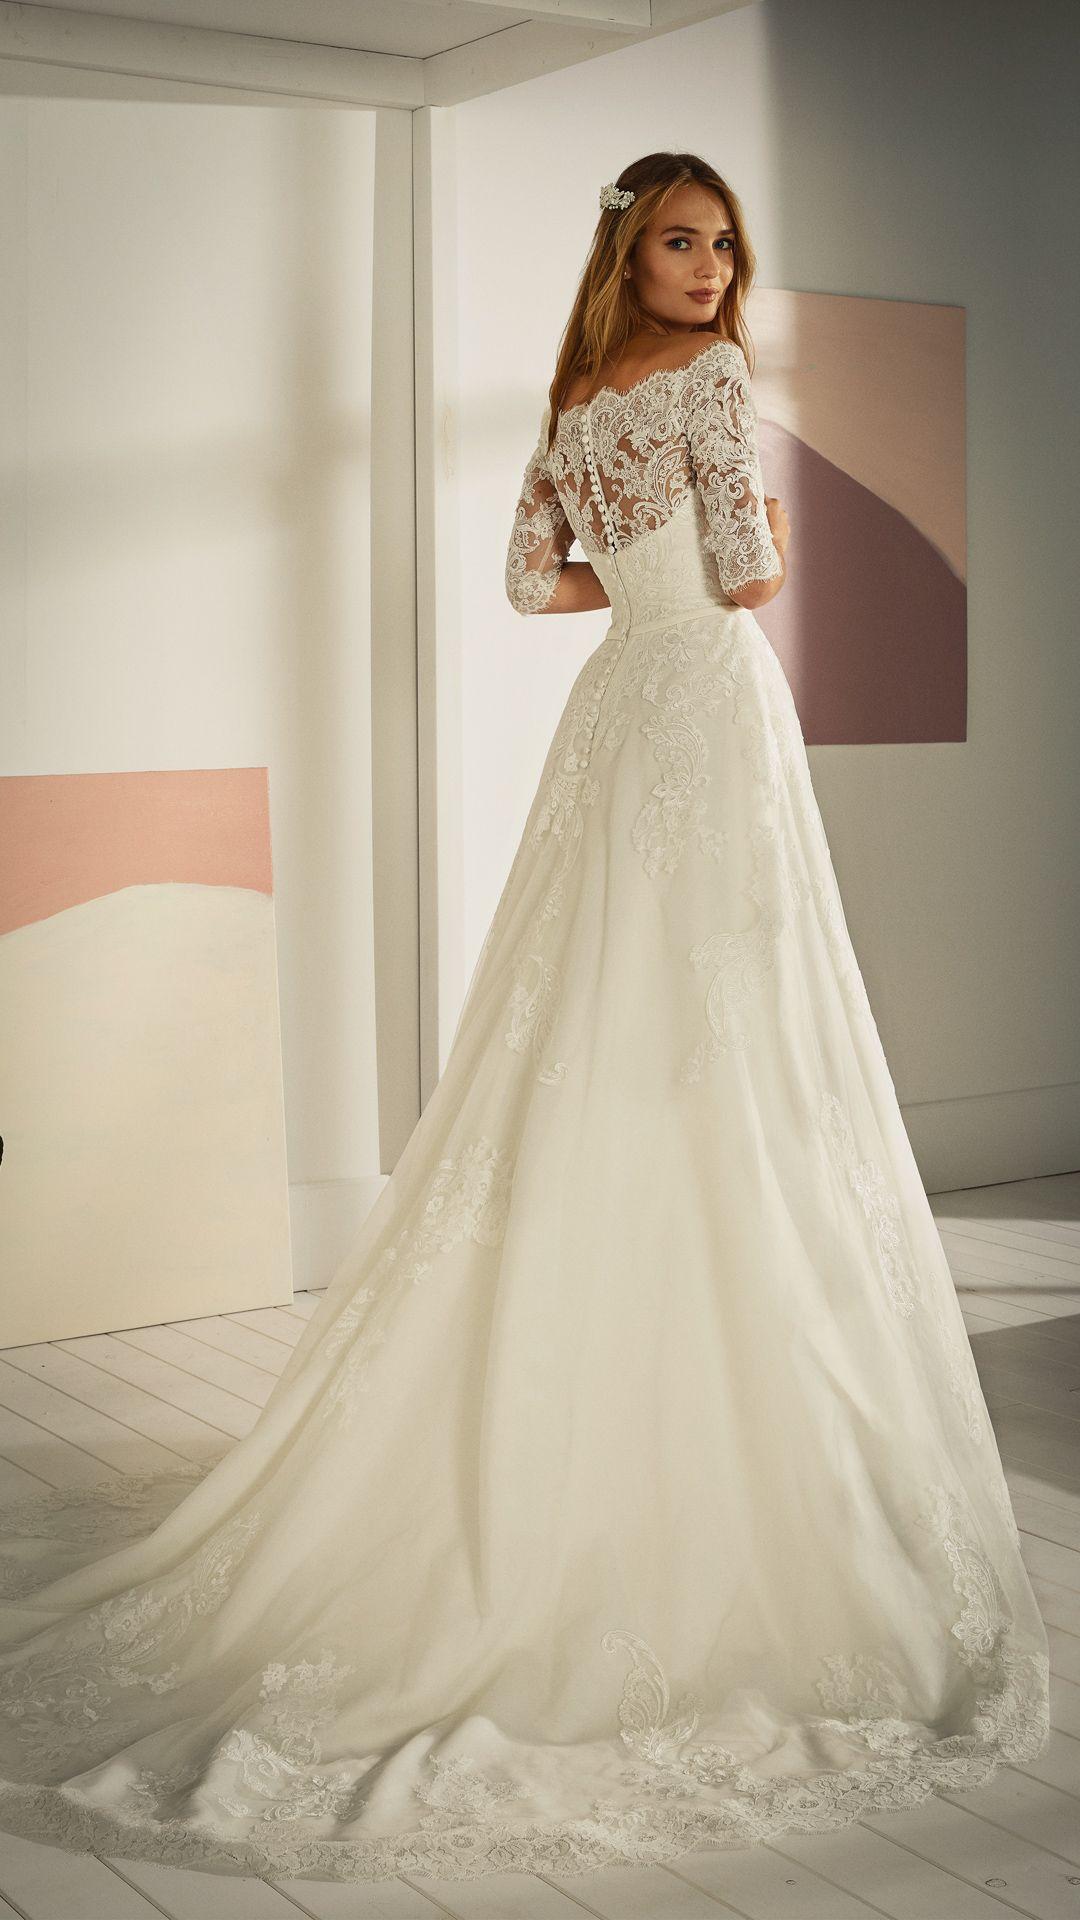 Hochzeitskleider 20 White One Kollektion Modell OSSA C ...